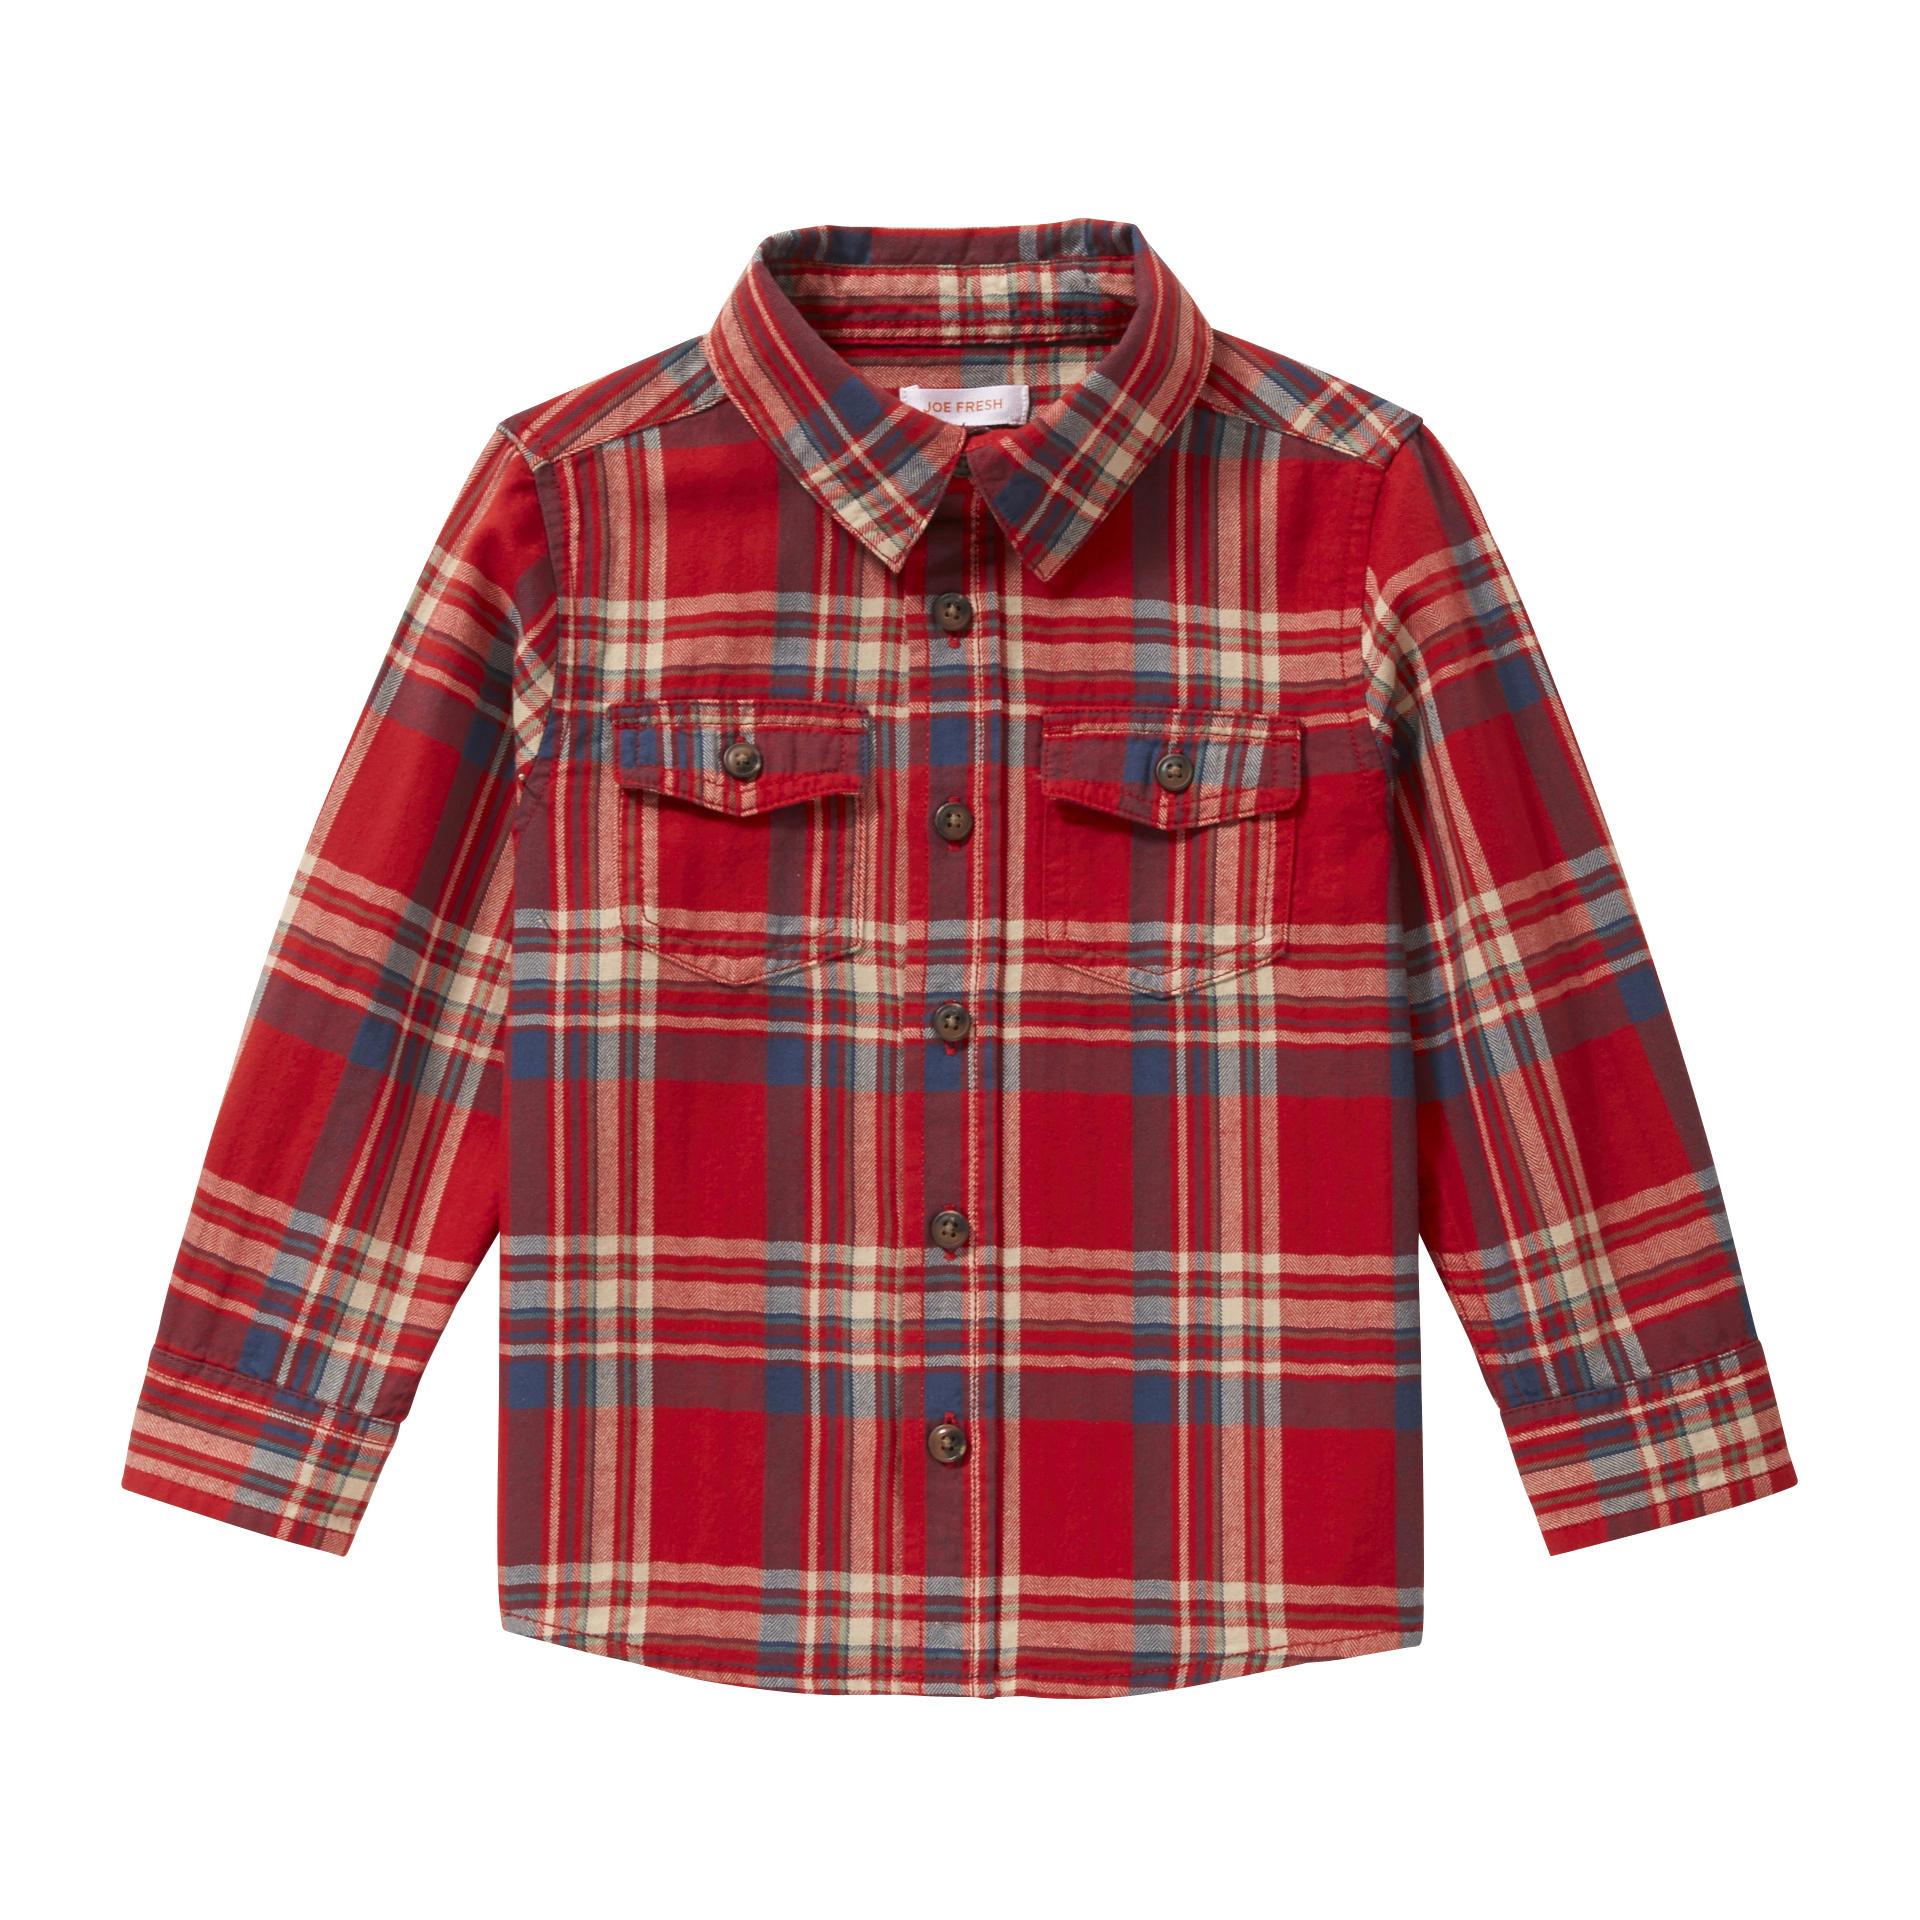 28e632bb Toddler Boy Red Flannel Shirt